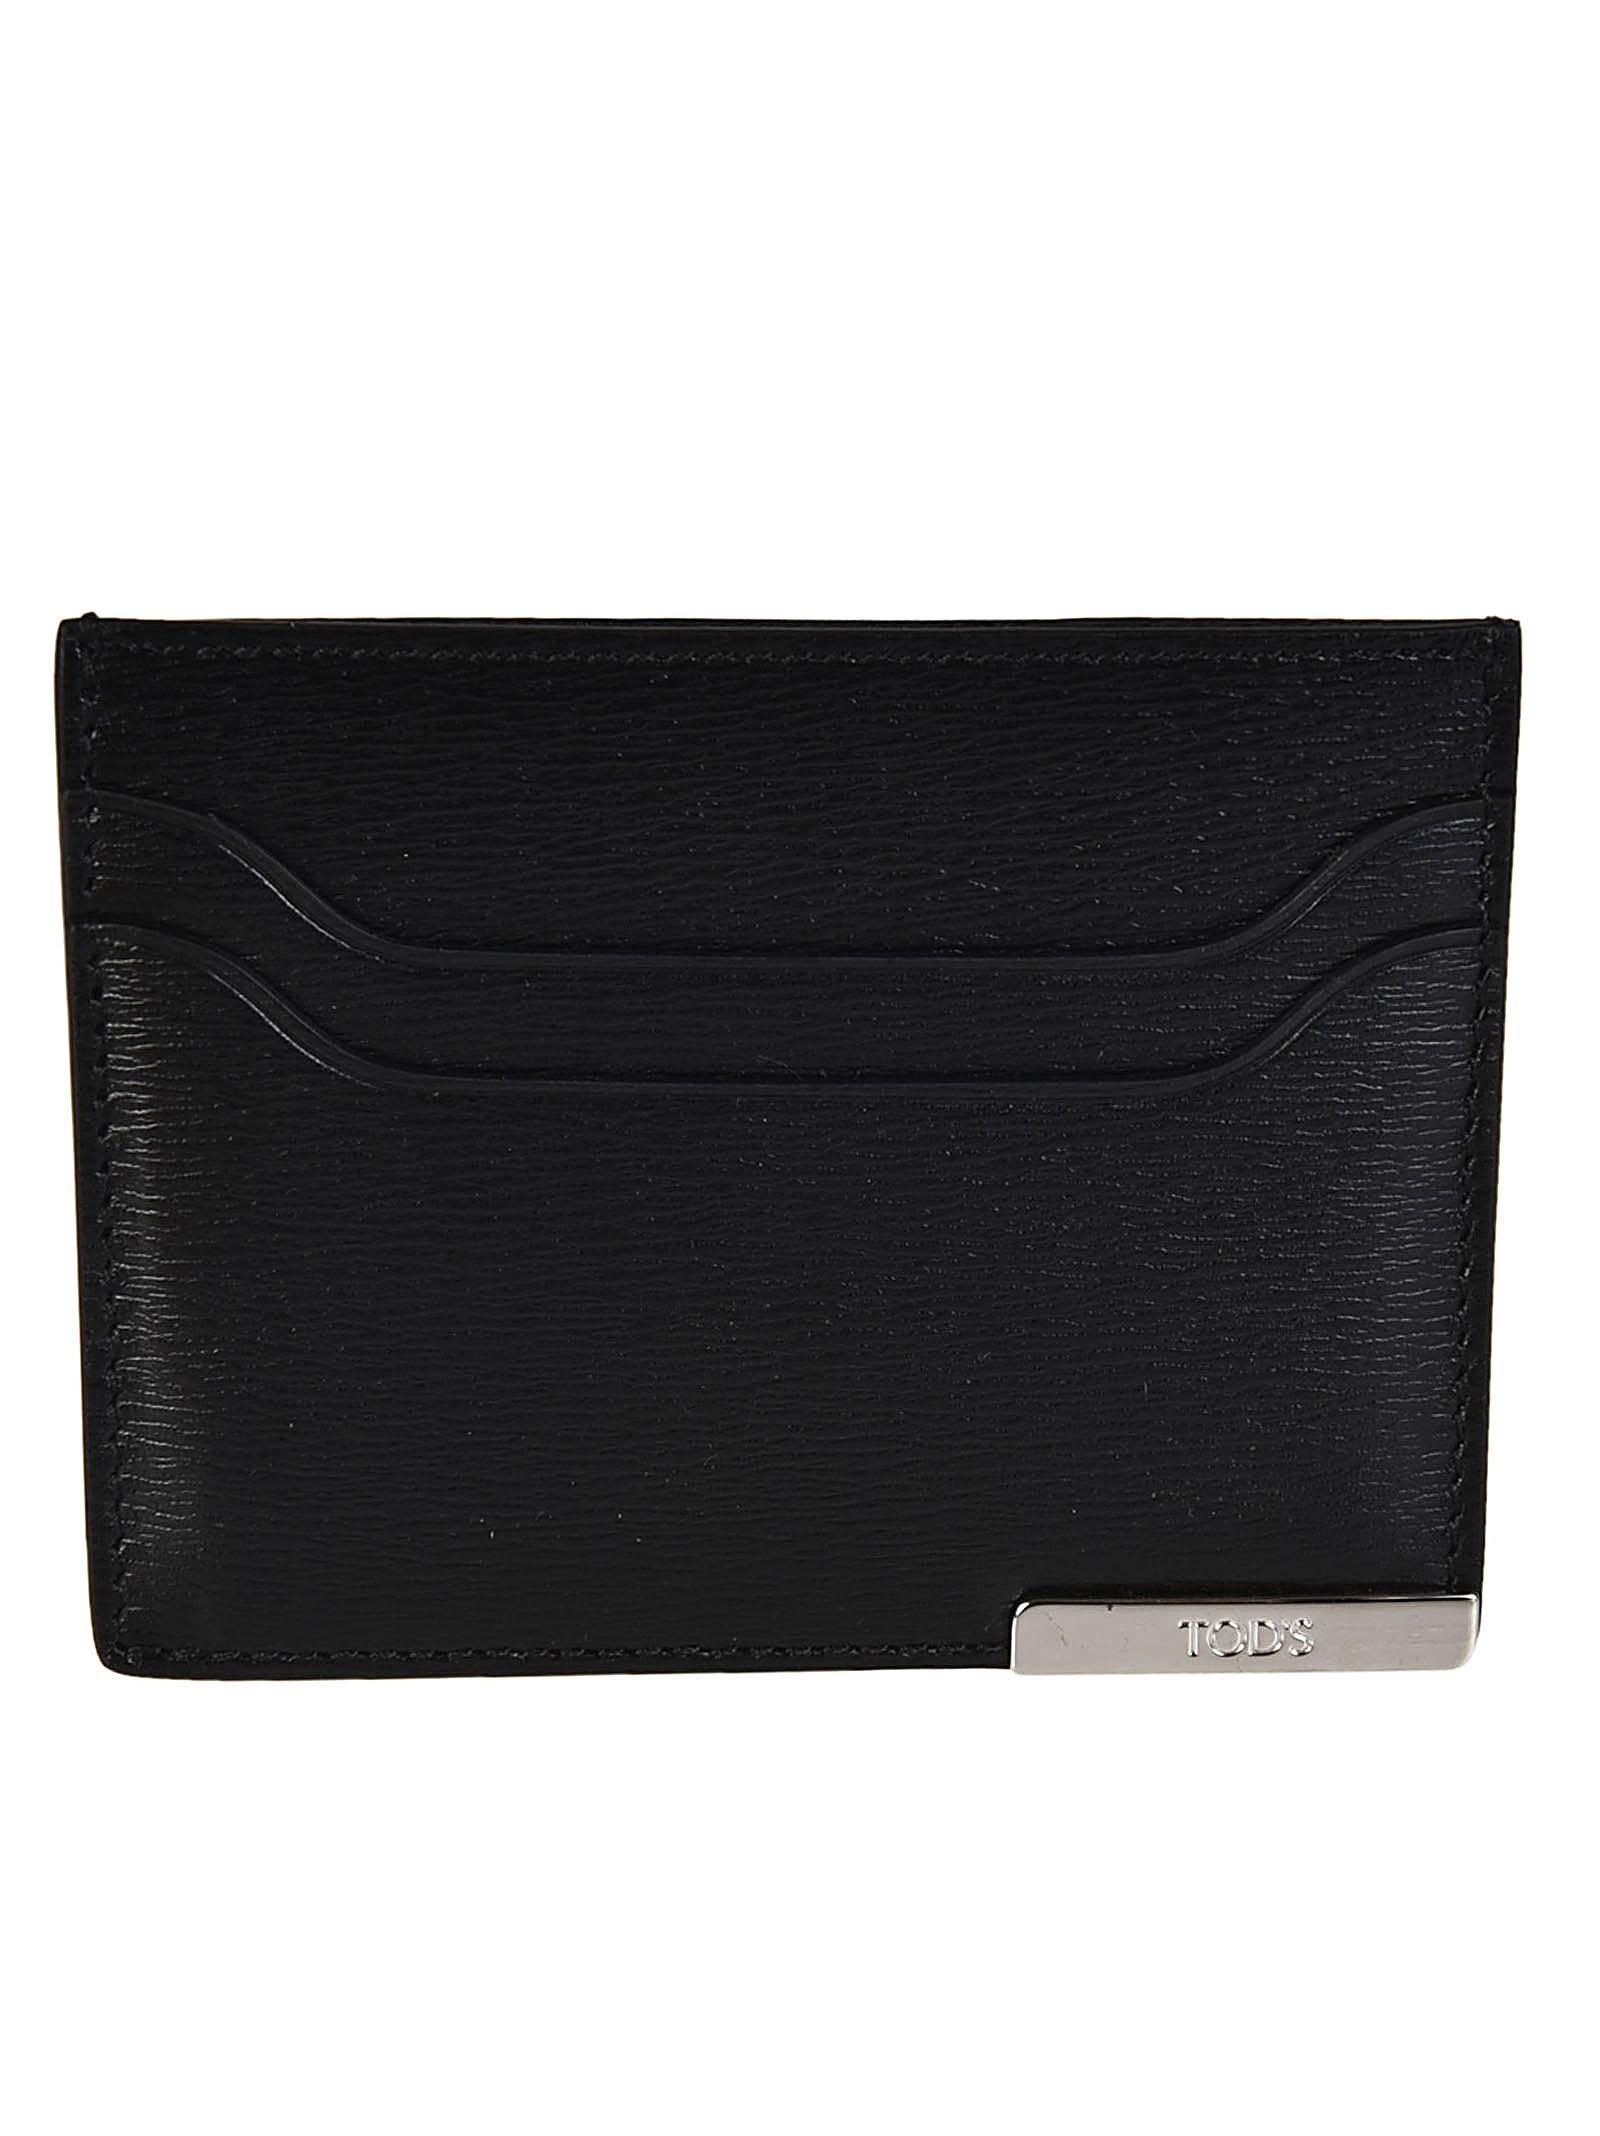 Tods Wallet